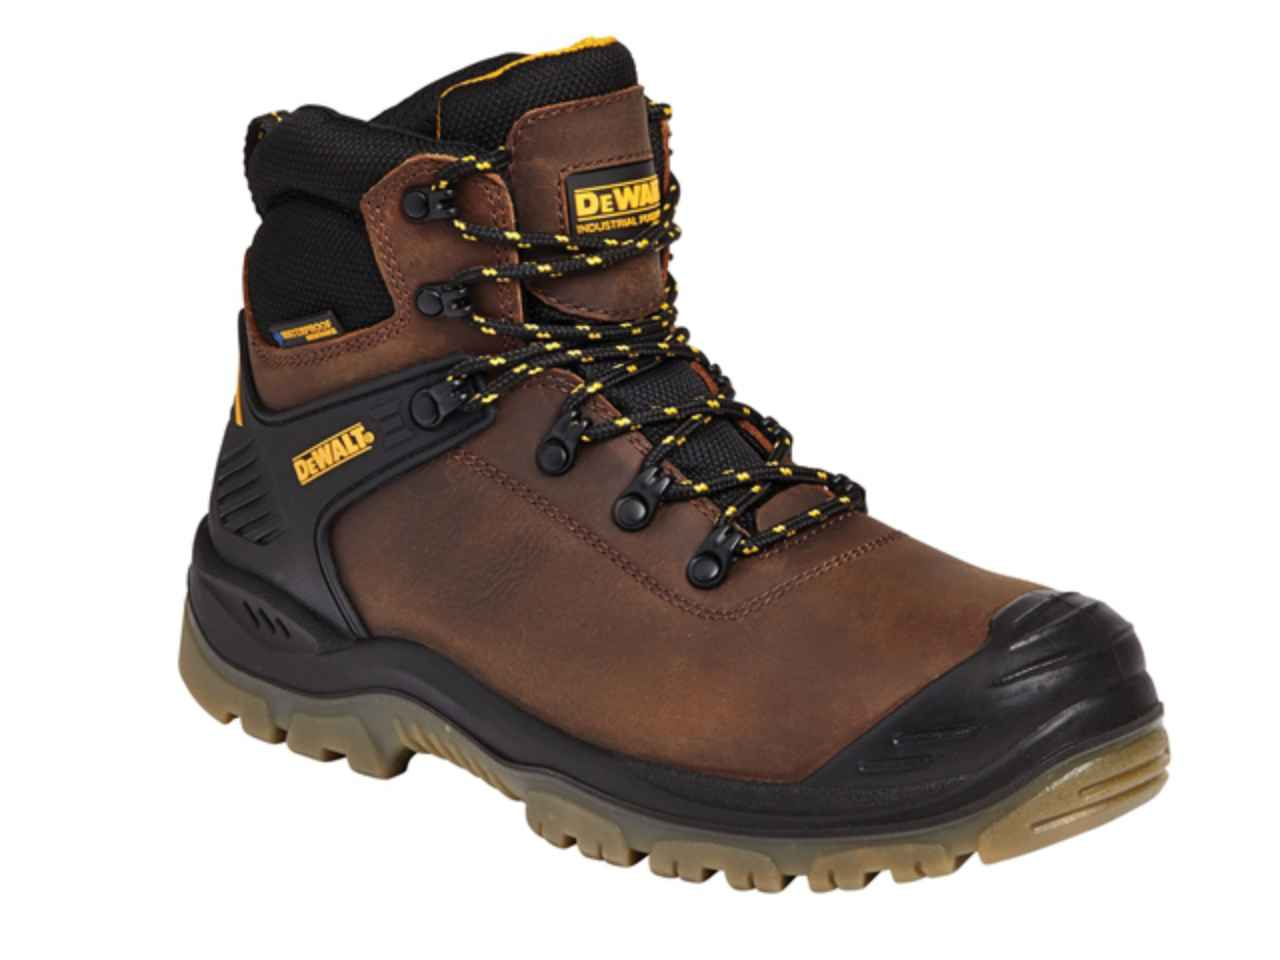 ab9a35c6480 DeWalt Newark S3 Waterproof Safety Hiker Boots Various Sizes